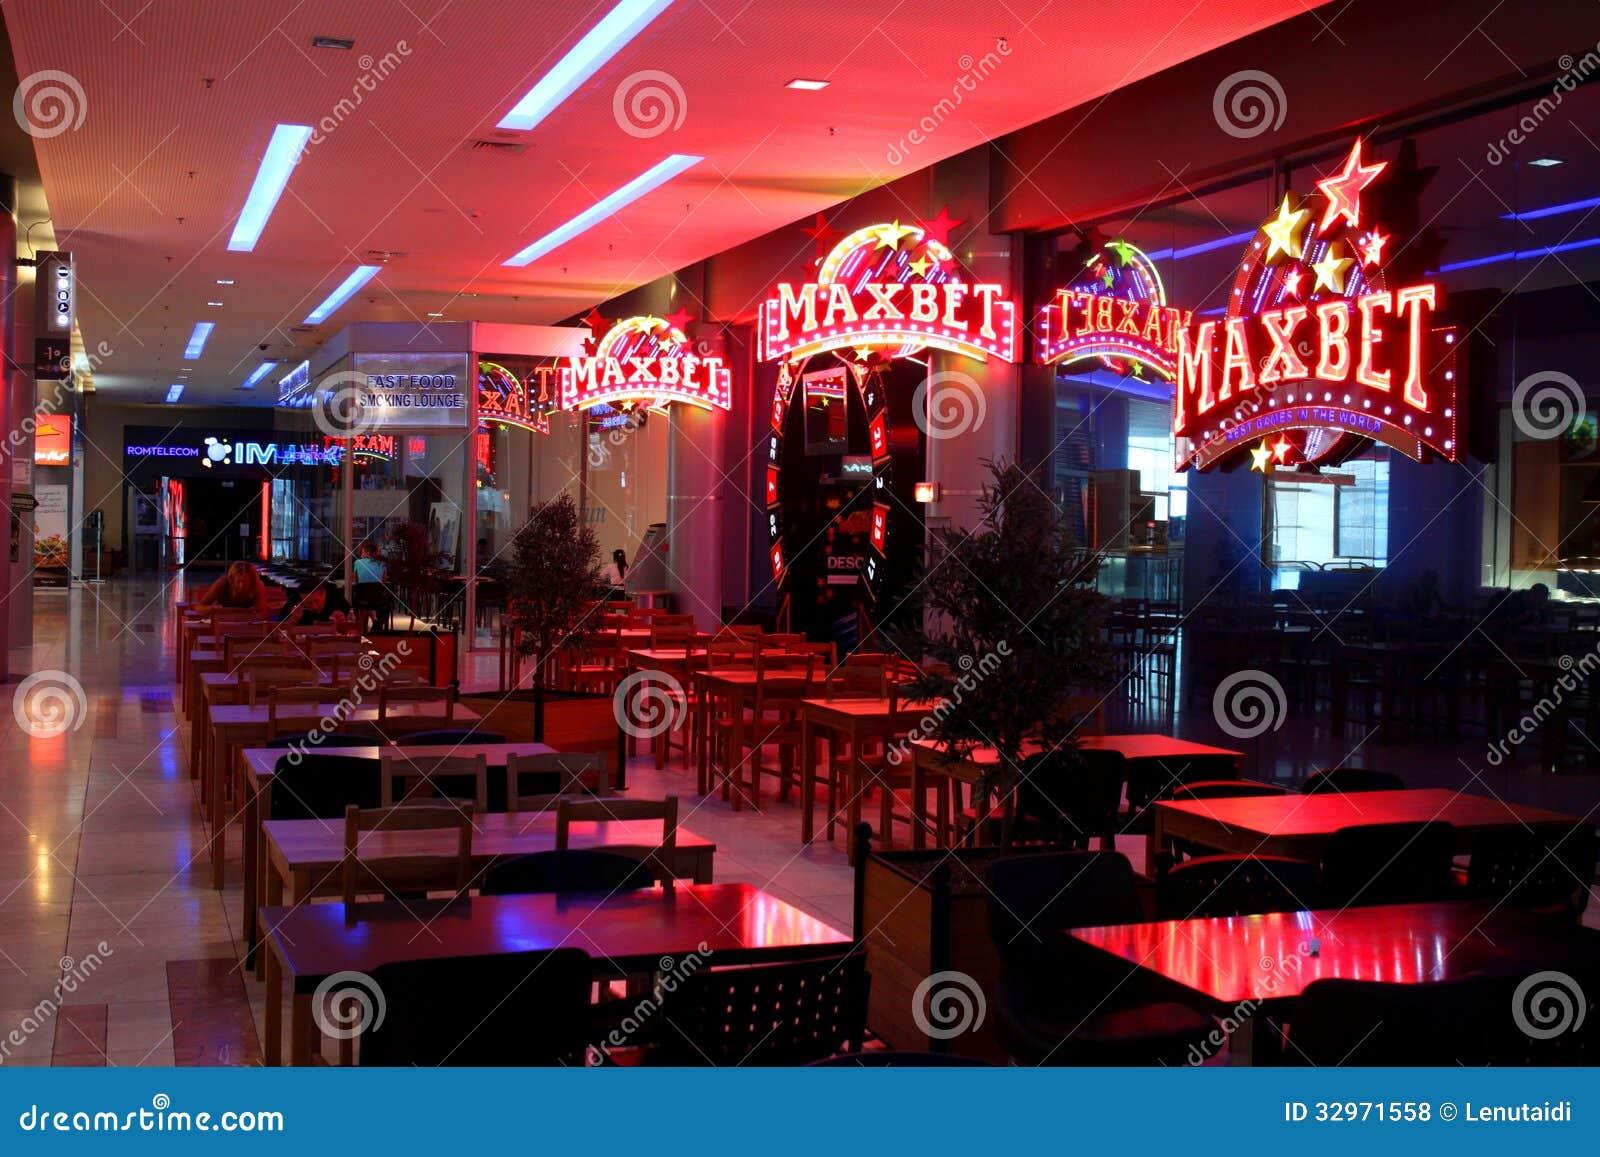 maxbet-electronic-gambling-saloon-afi-palace-cotroceni-mall-bucharest-romania-32971558.jpg